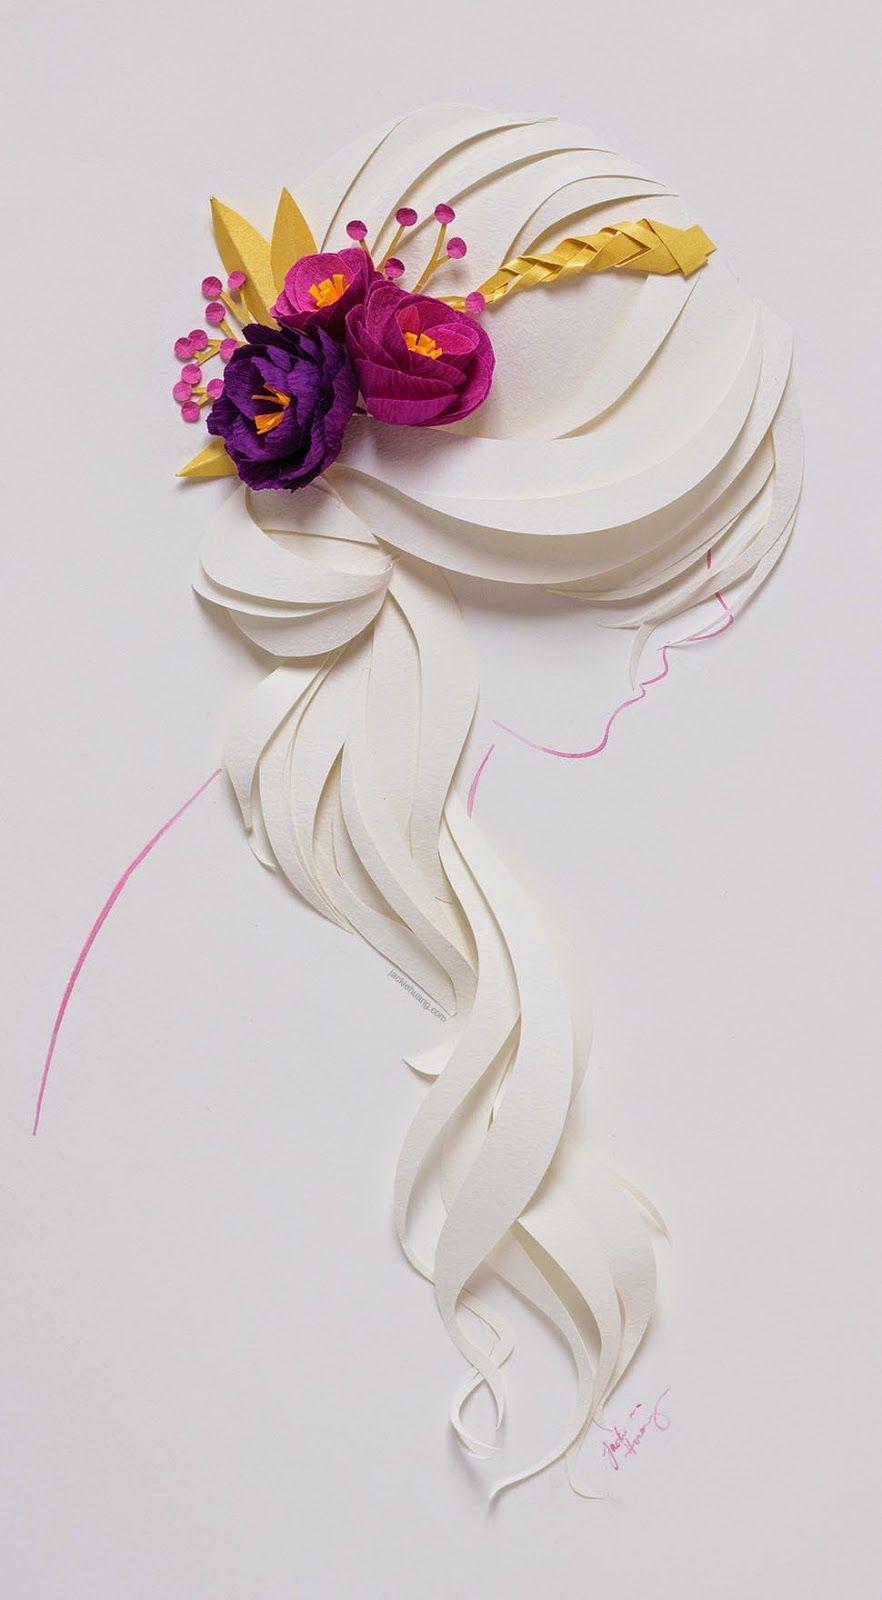 Jackie Huang Paper Art Paper Sculpture Paper